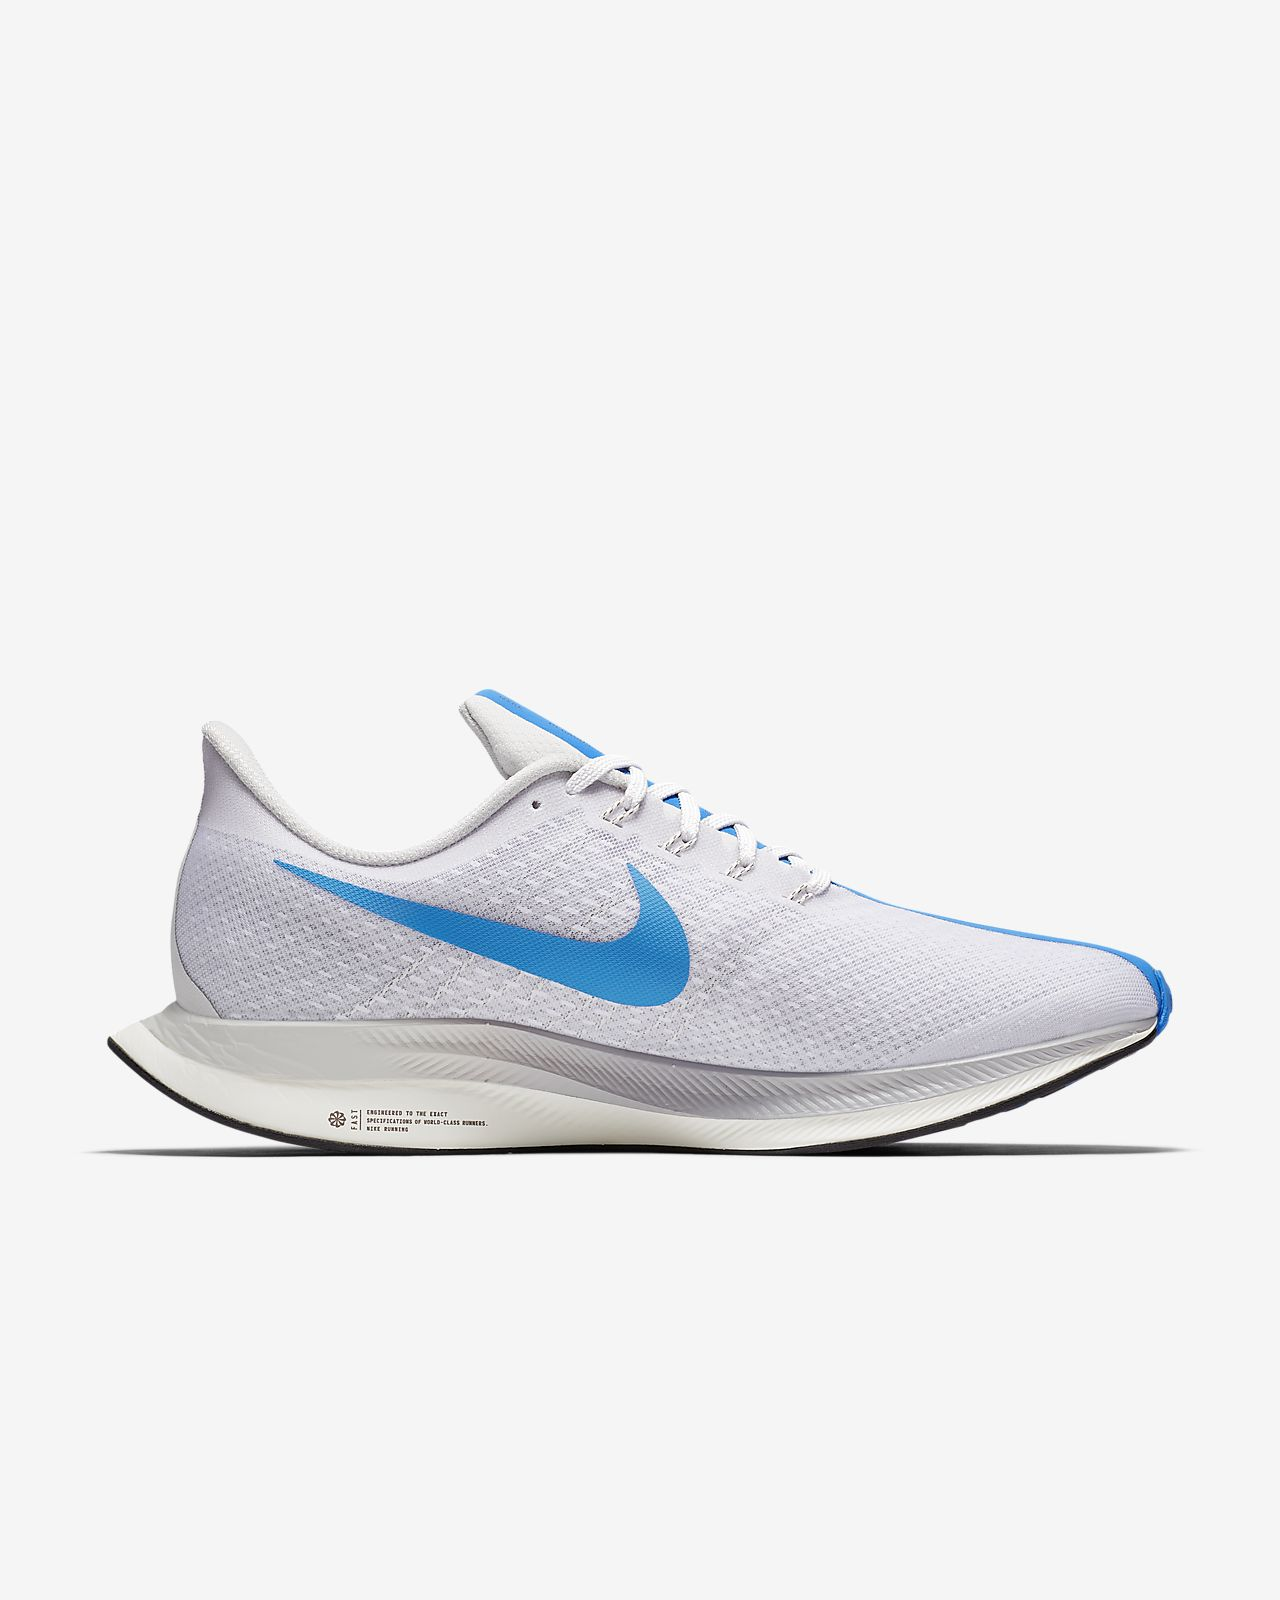 Nike Zoom Pegasus Turbo วางจำหน่ายที่ Supersports แล้ว